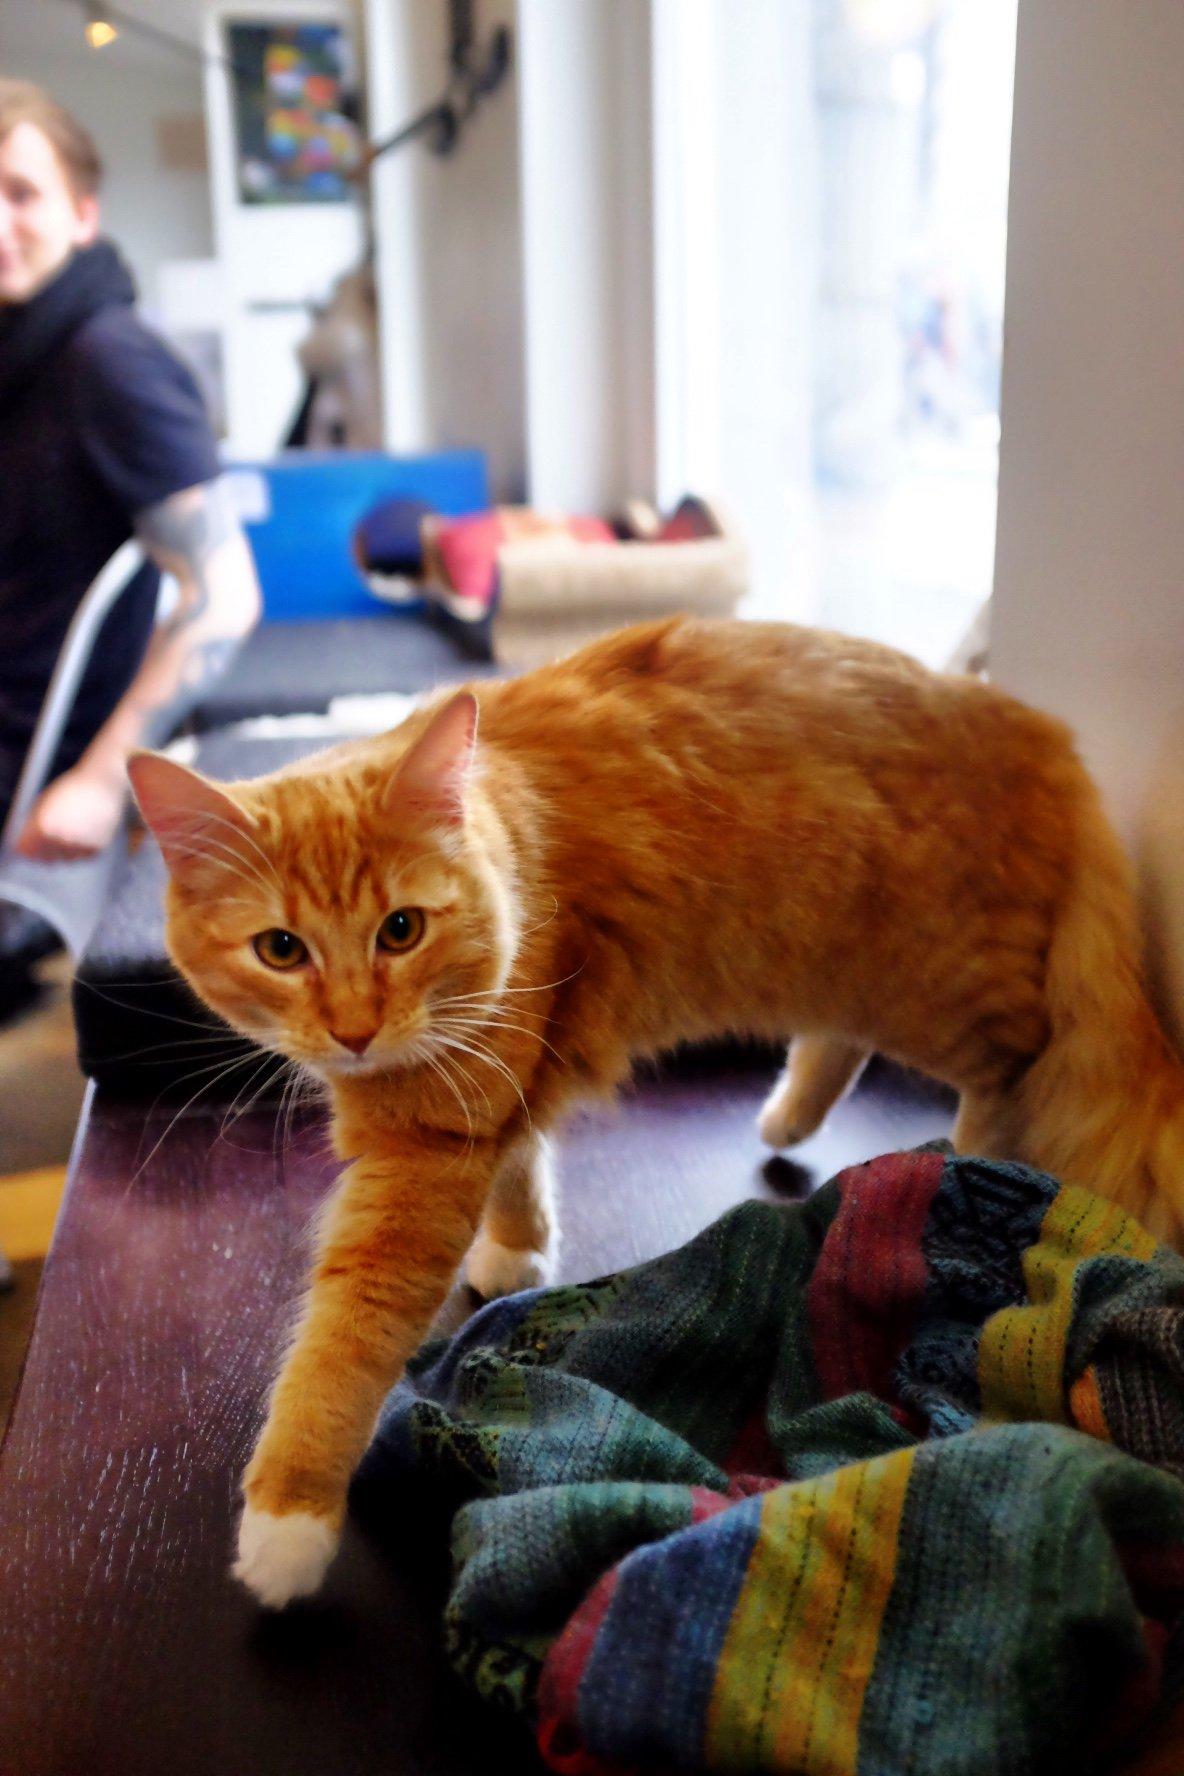 Ginger cat in the cat cafe in Tallinn walking towards us